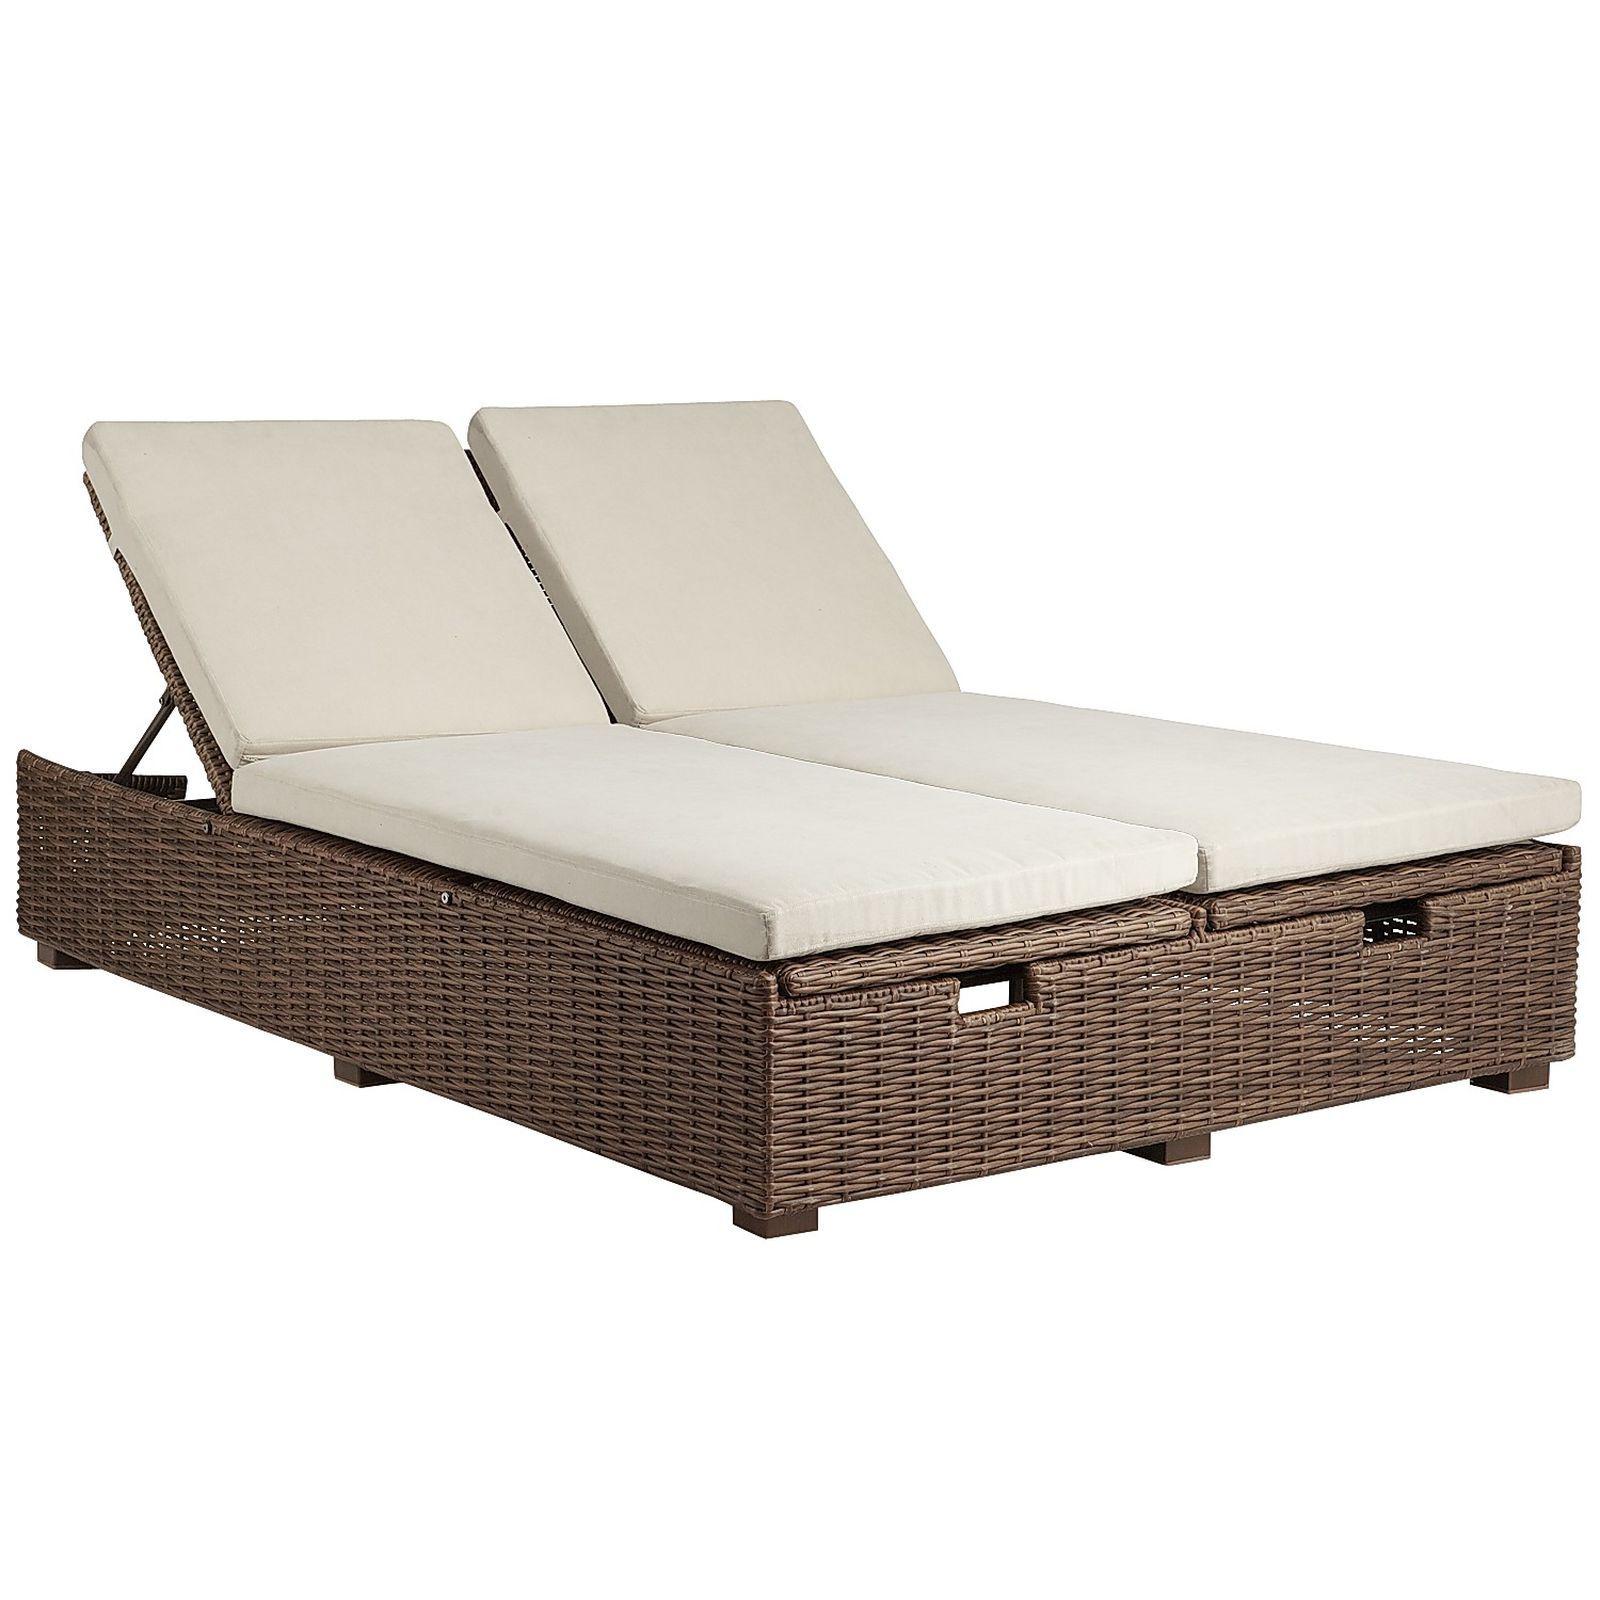 Echo Beach Double Chaise Lounge Latte Double Chaise Lounge Outdoor Double Chaise Lounge Outdoor Chaise Lounge